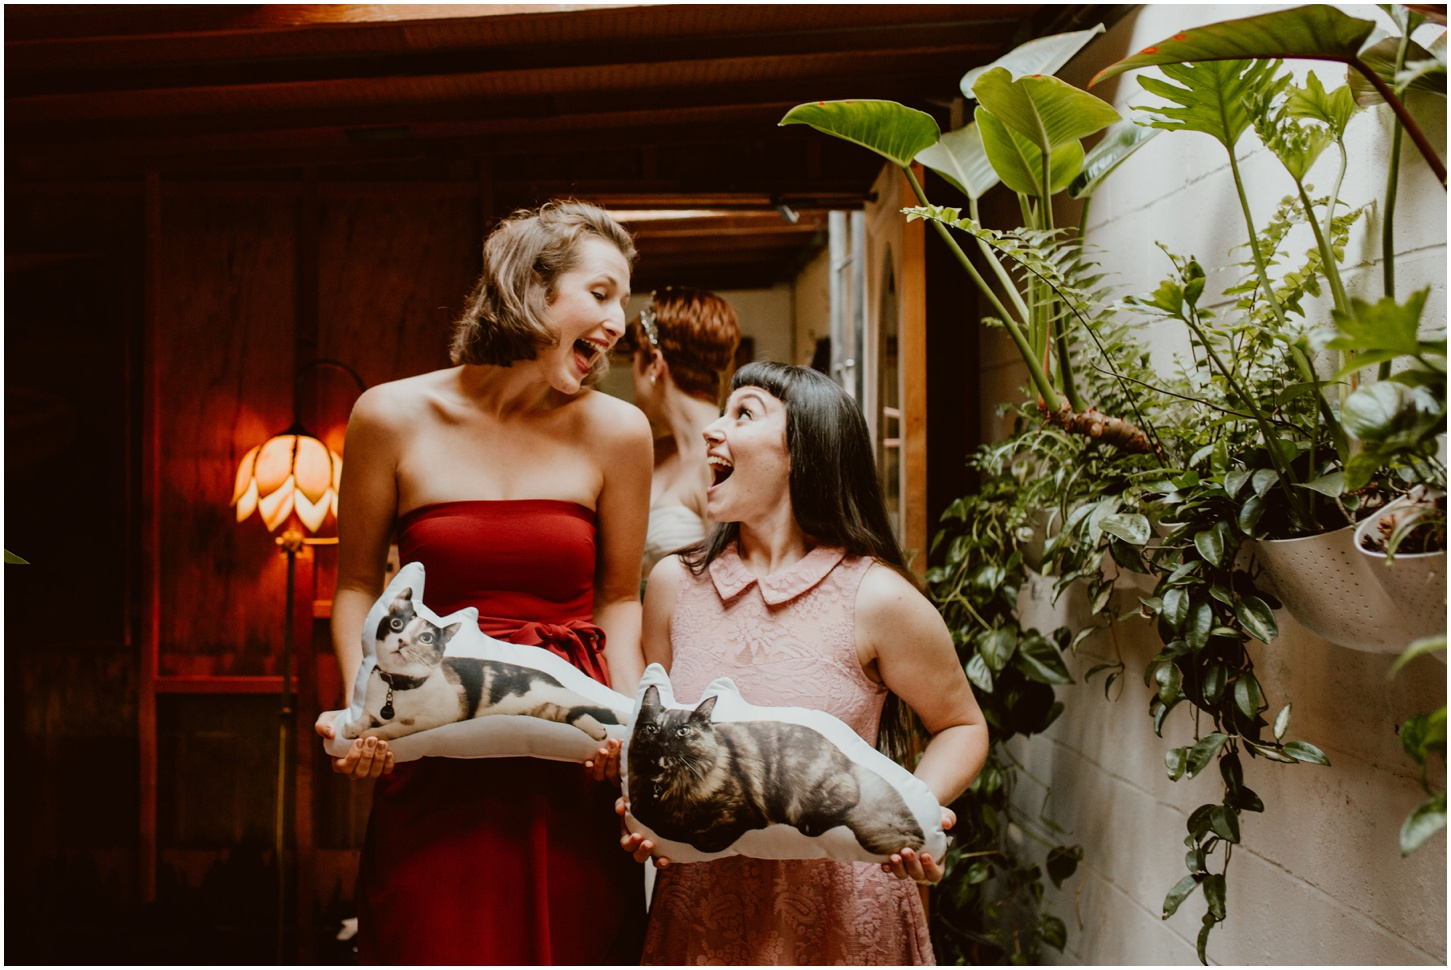 Smogshoppe-Wedding-S+C-Diana-Lake-Photography-350.jpg